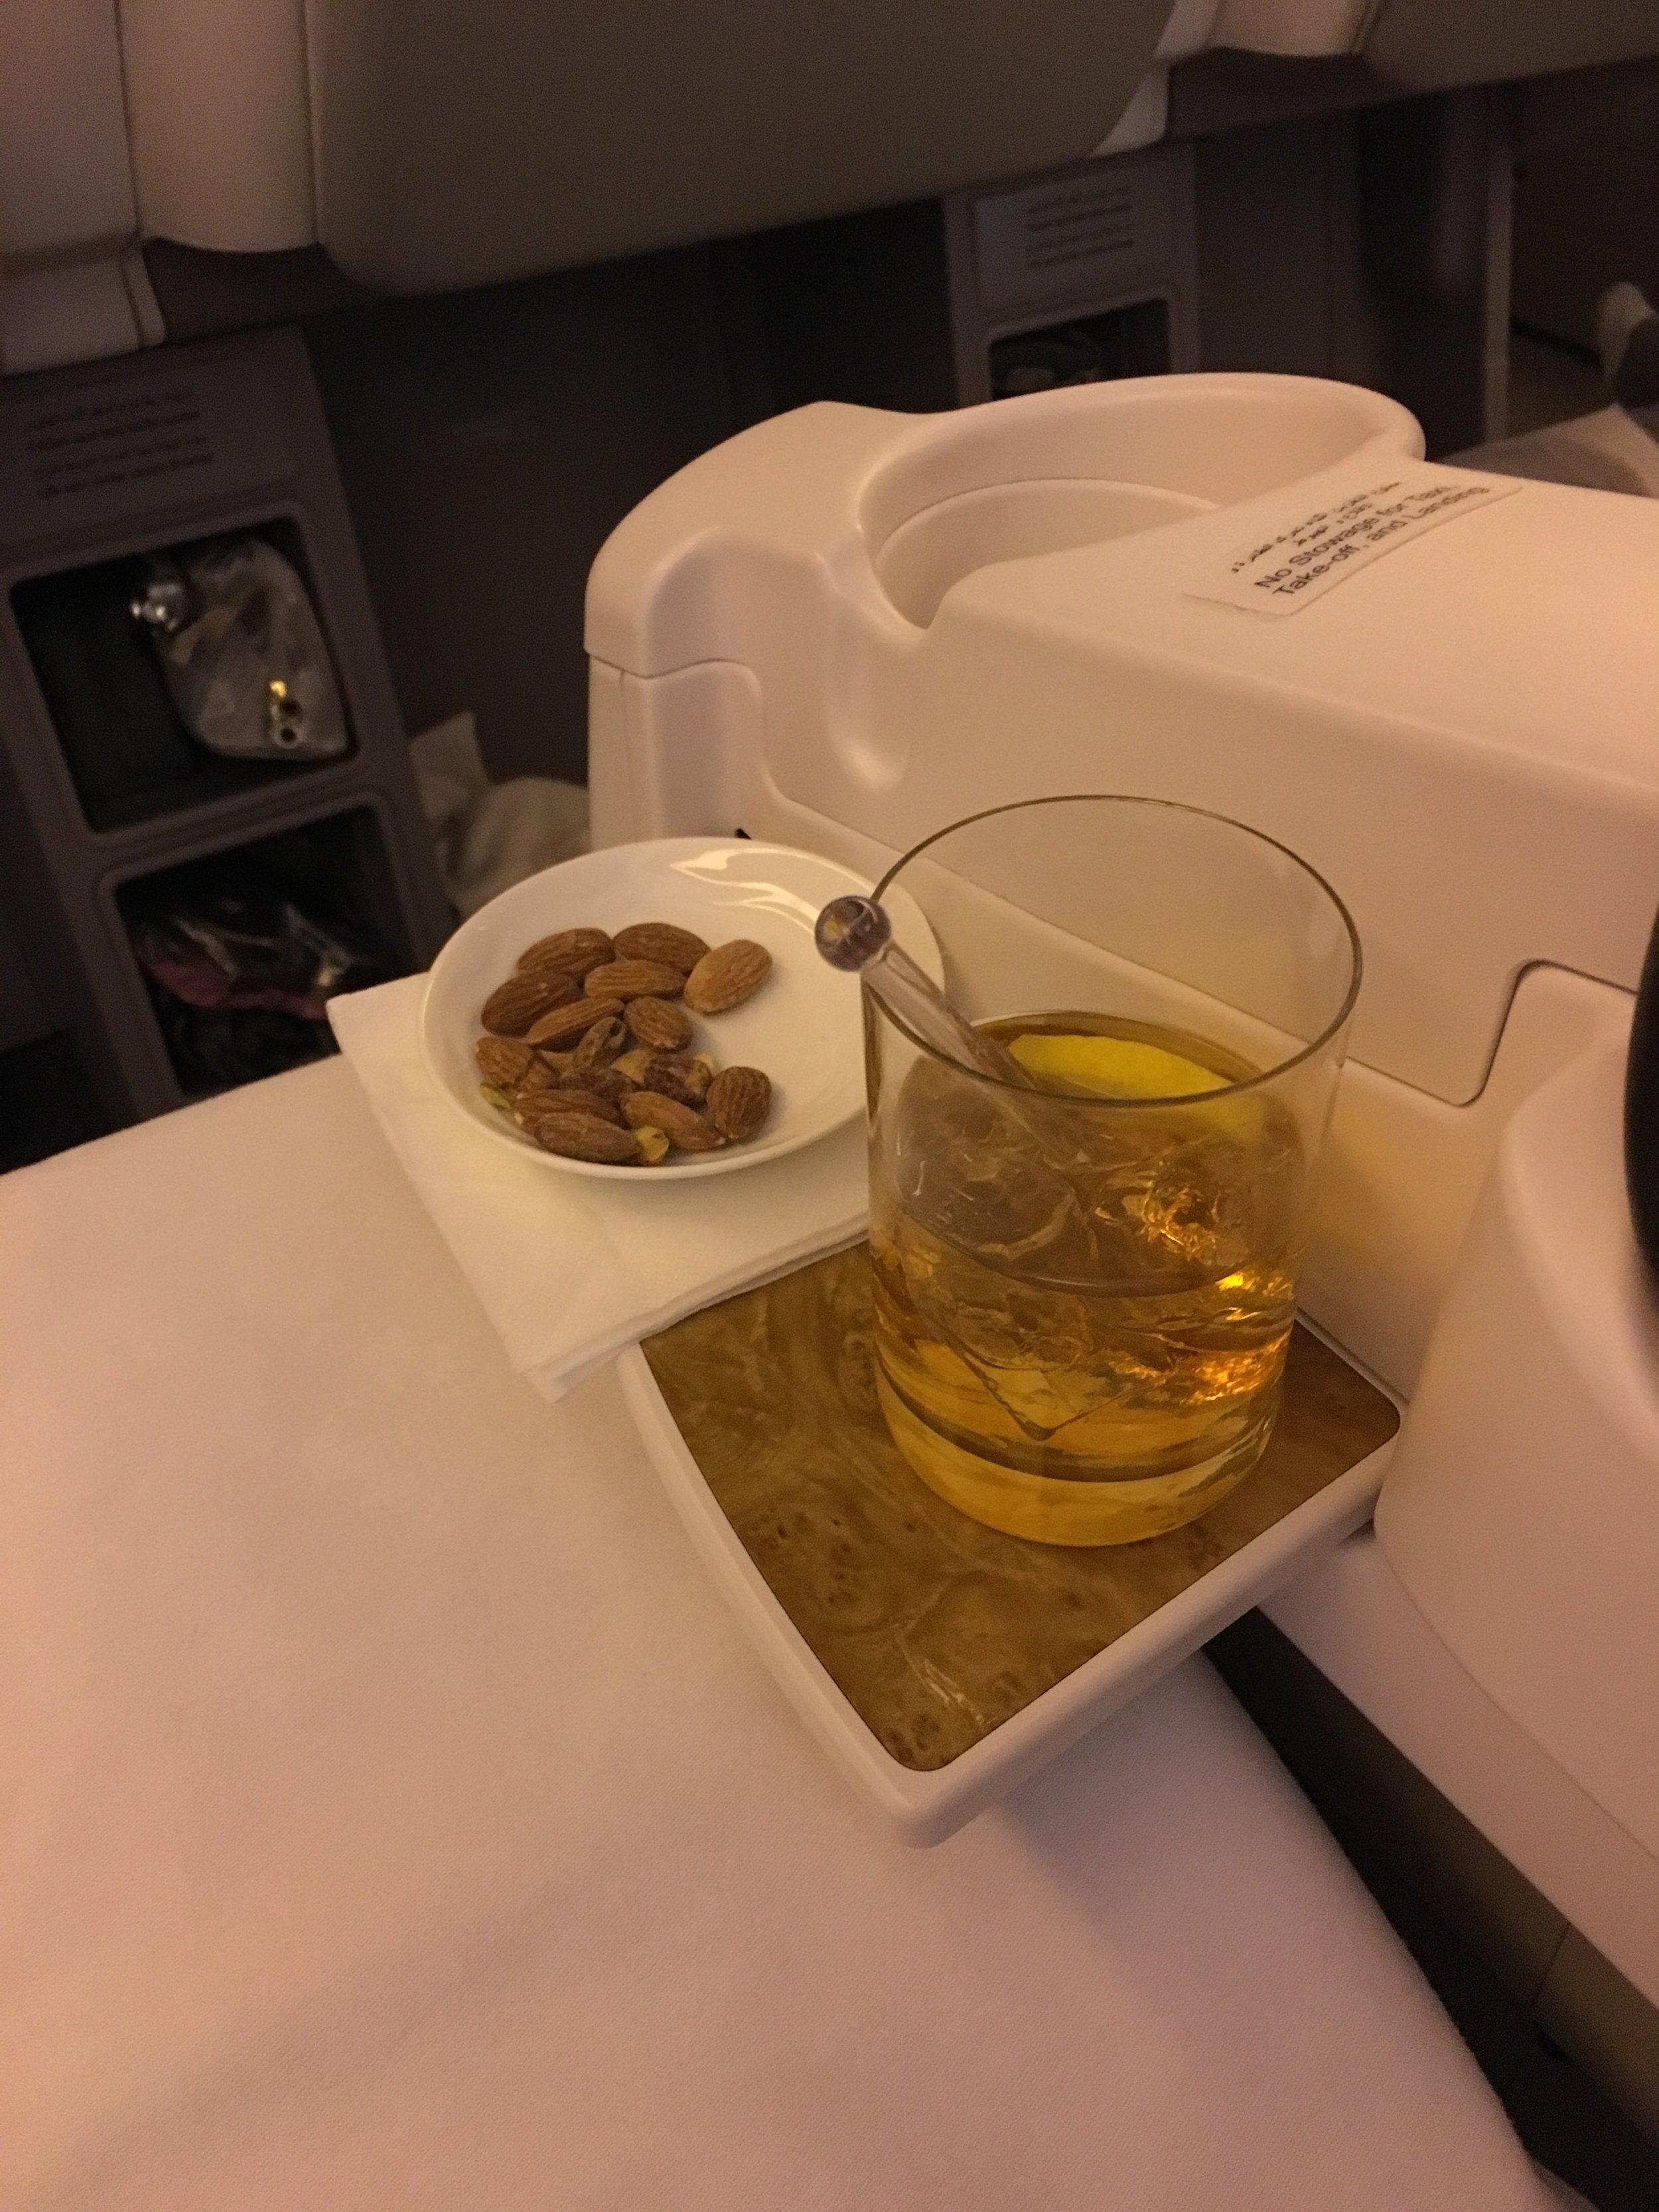 Chivas Regal 18 year old Scotch whisky